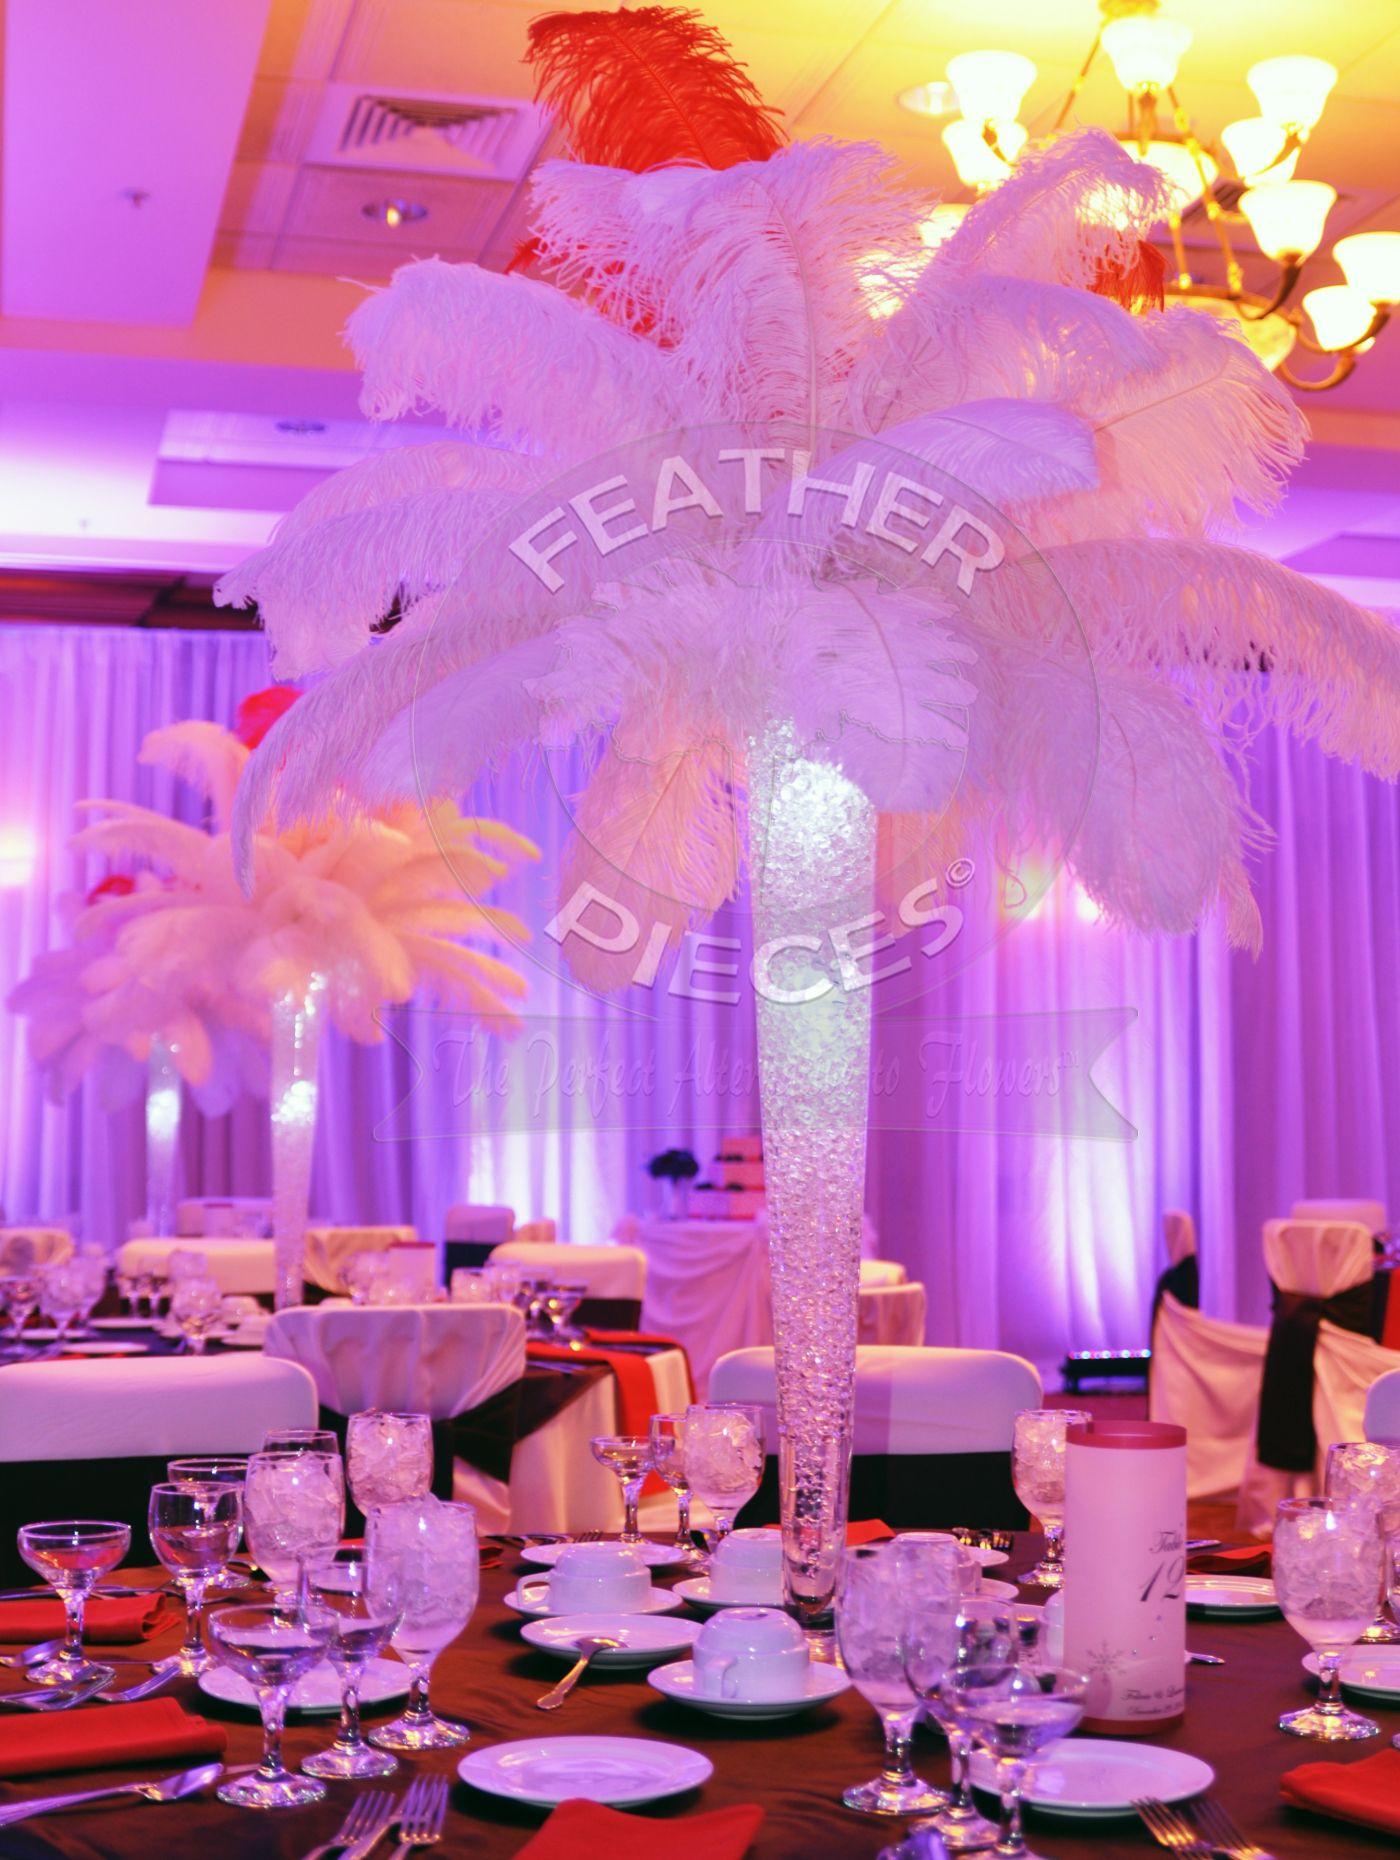 Rent Ostrich Feather Centerpieces by FeatherPieces.com | Party Ideas ...